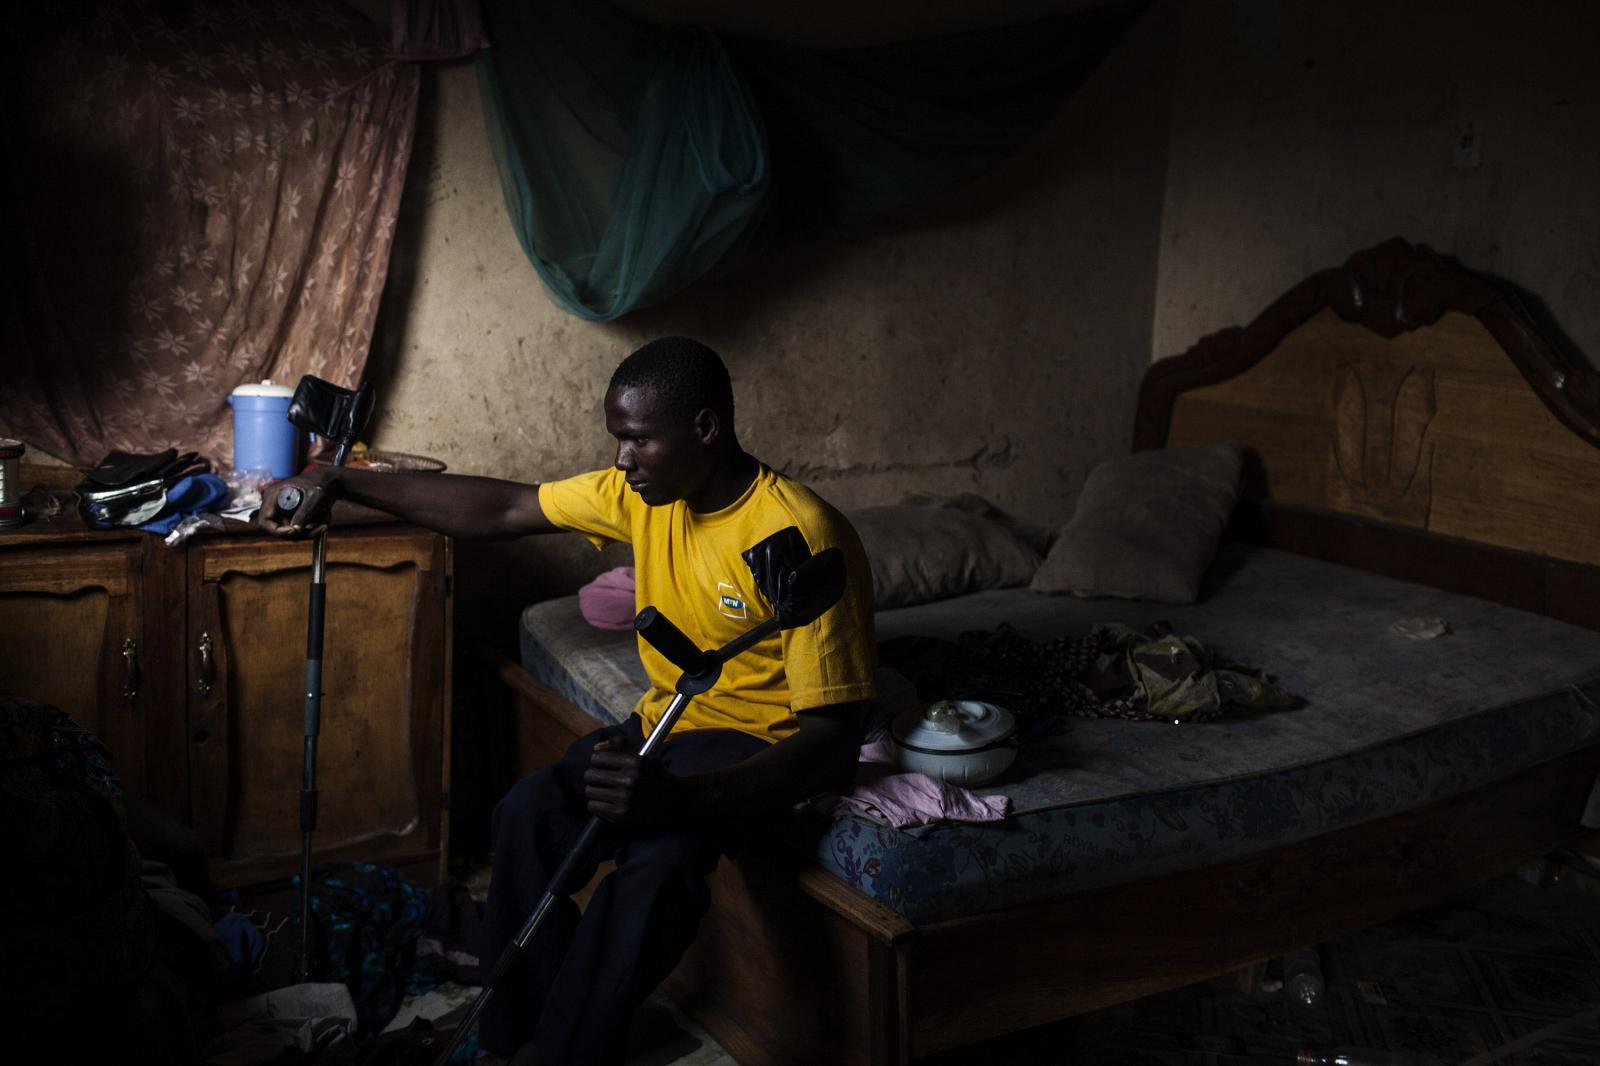 Photography image - Loading parasoccer-Nigeria-002.jpg